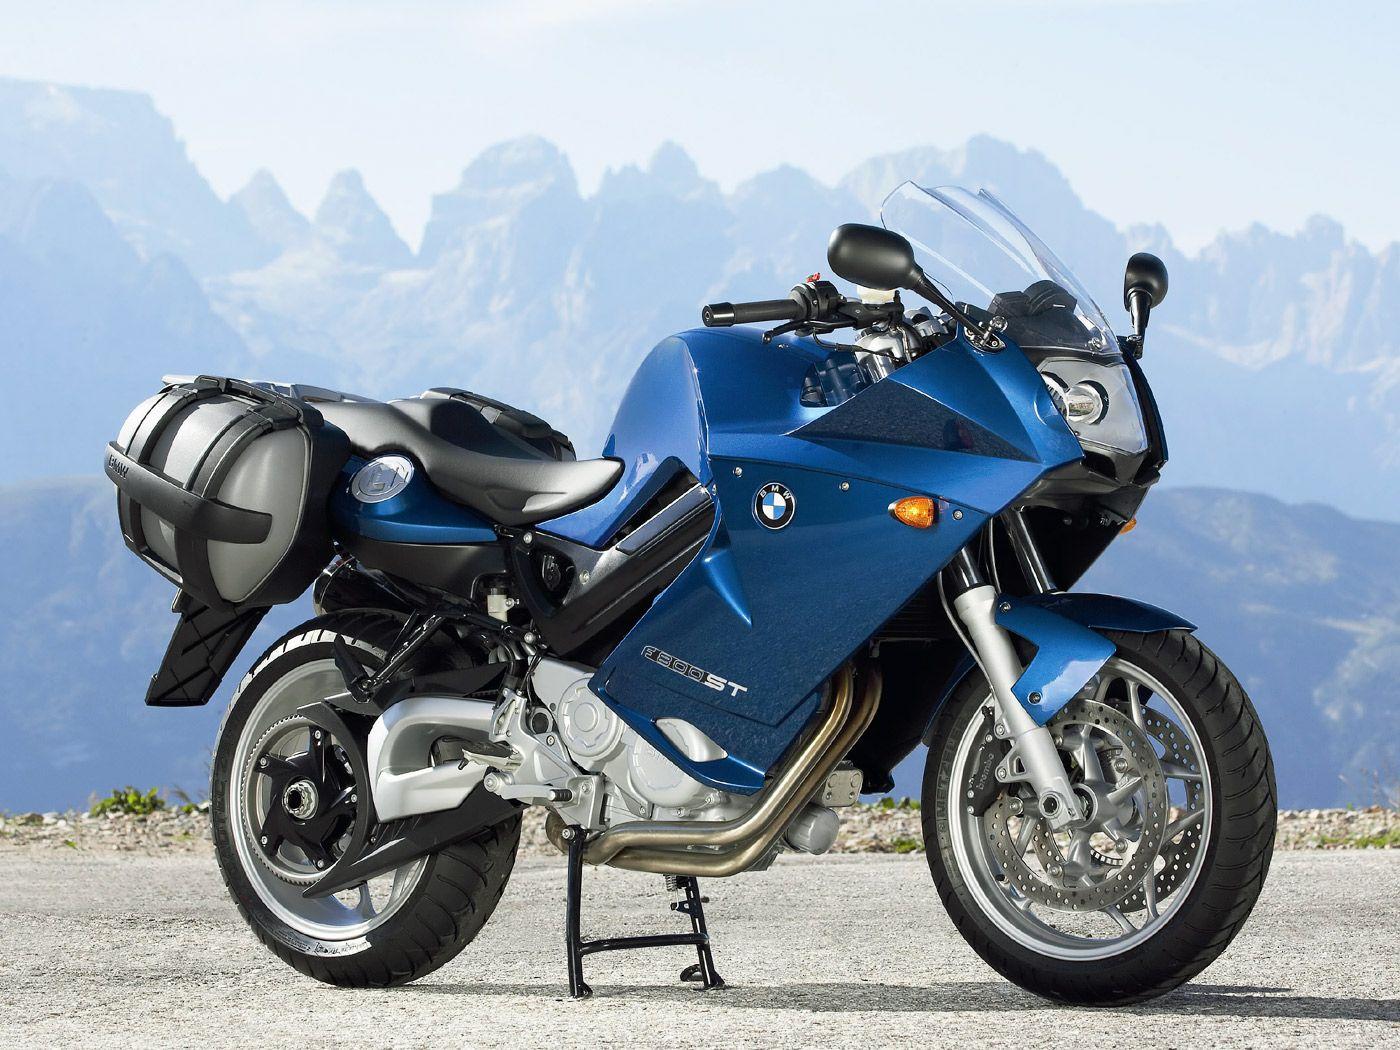 Bmw Motorcycles F 800 Gs Bmw F 800 St Sport Touring Desktop